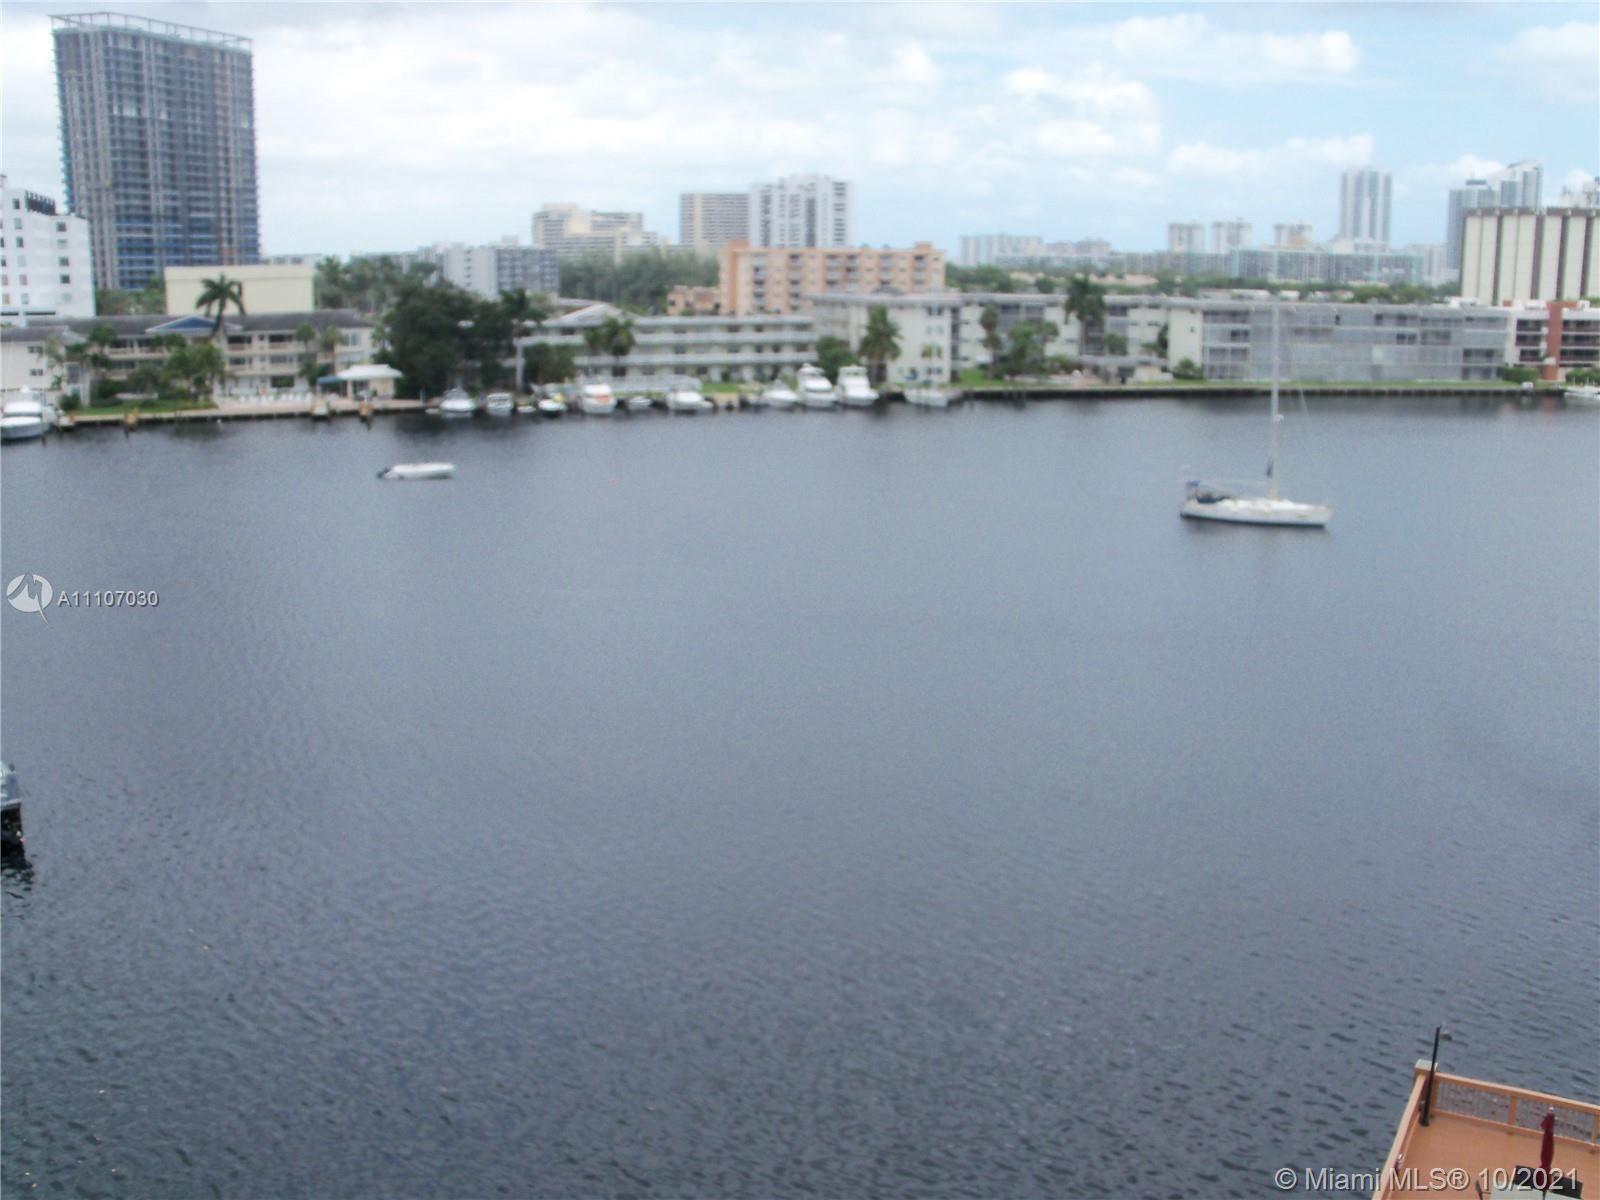 Photo of 410 Golden Isles Dr #701, Hallandale Beach, FL 33009 (MLS # A11107030)